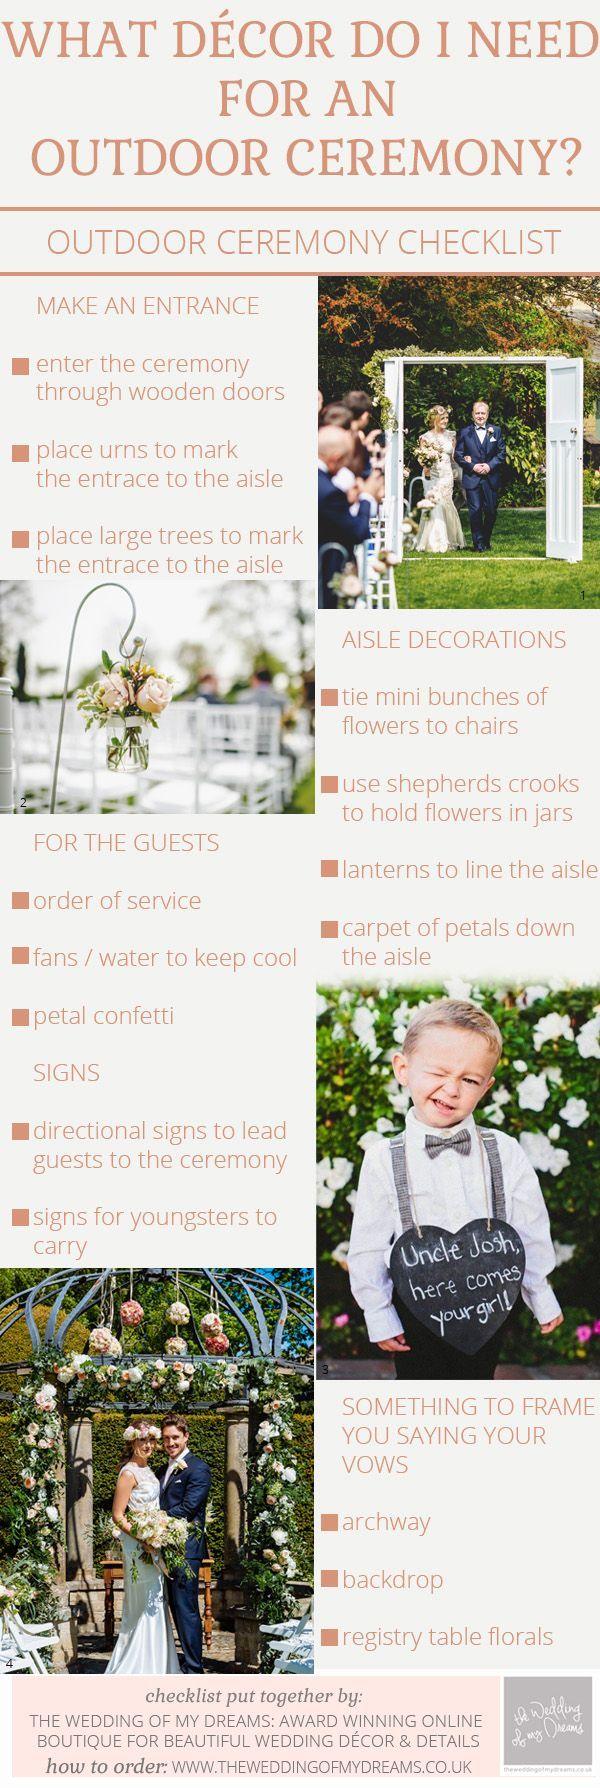 Outdoor Wedding Ceremony Decorations – Checklist / http://www.deerpearlflowers.com/rustic-beach-outdoor-wedding-checklist/